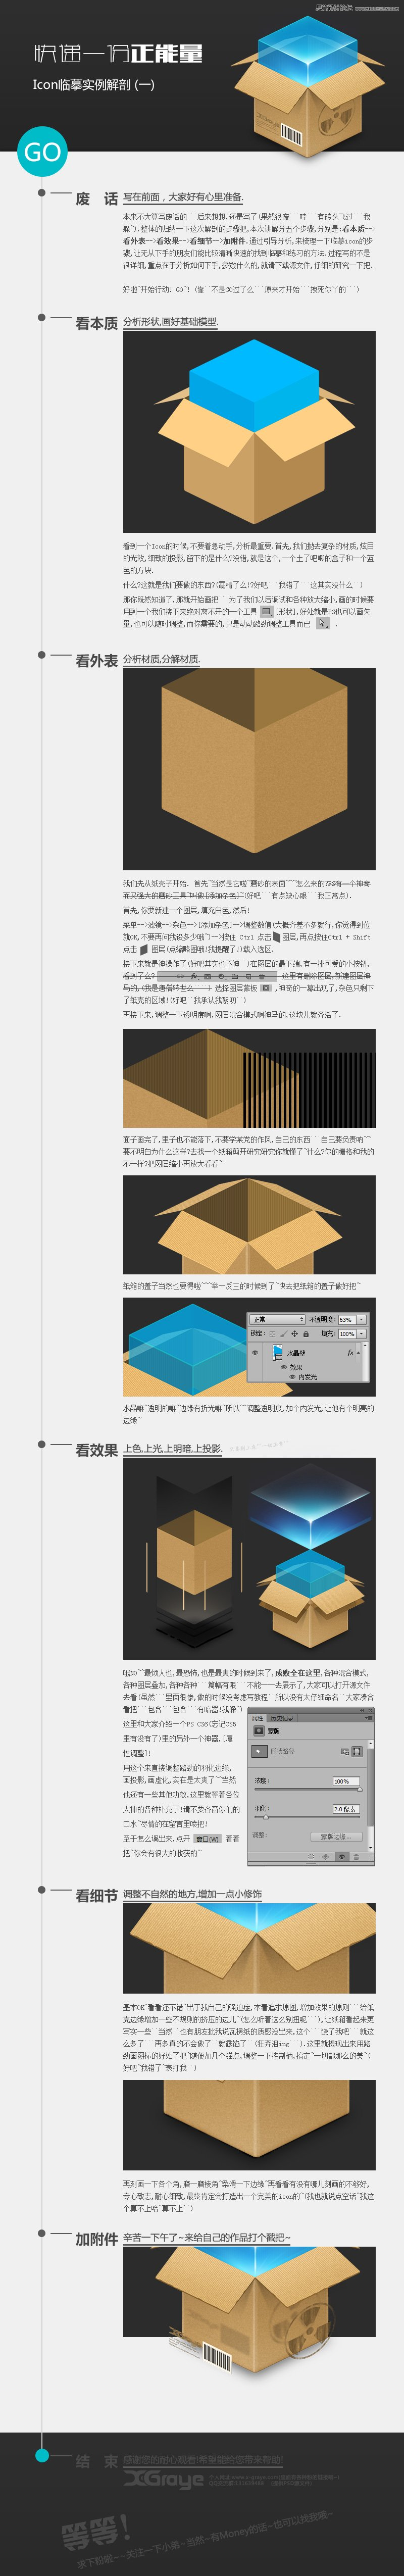 <a href=http://www.cnwebshow.com/http://www.cnwebshow.com/edu/photoshop/ target=_blank class=infotextkey>Photoshop</a>设计水晶质感的立体盒子教程,PS教程